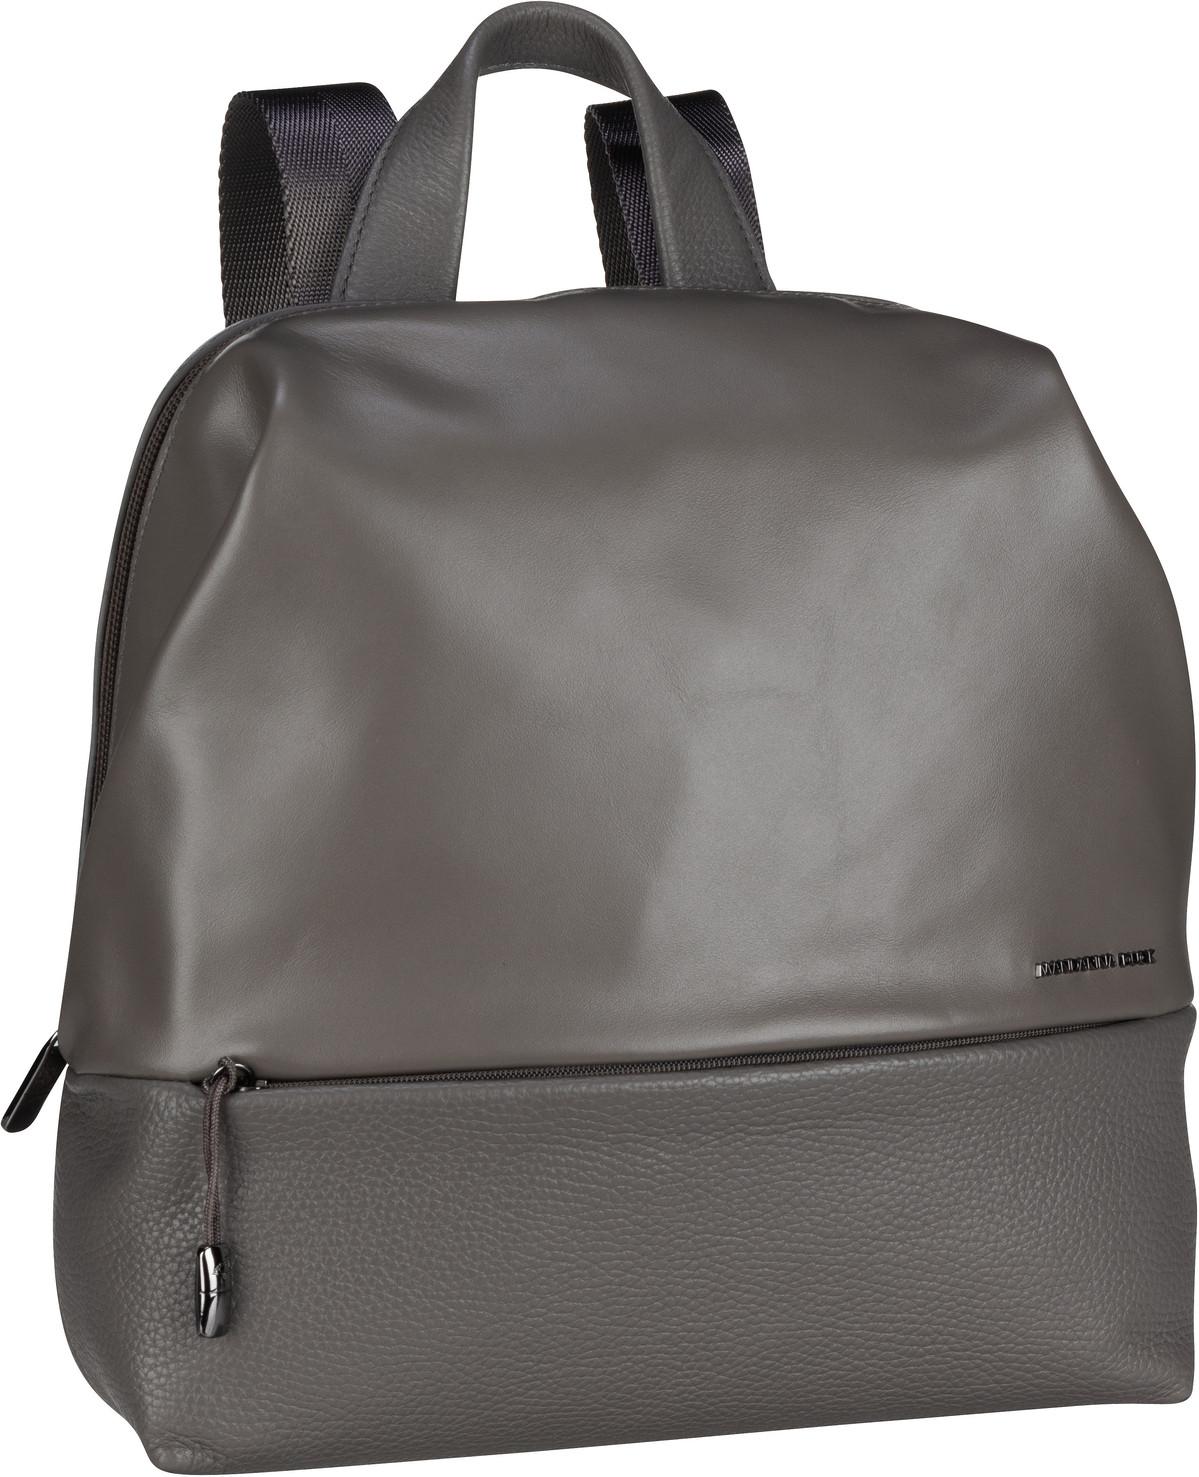 Rucksack / Daypack Athena XS Backpack UPT11 Soldier